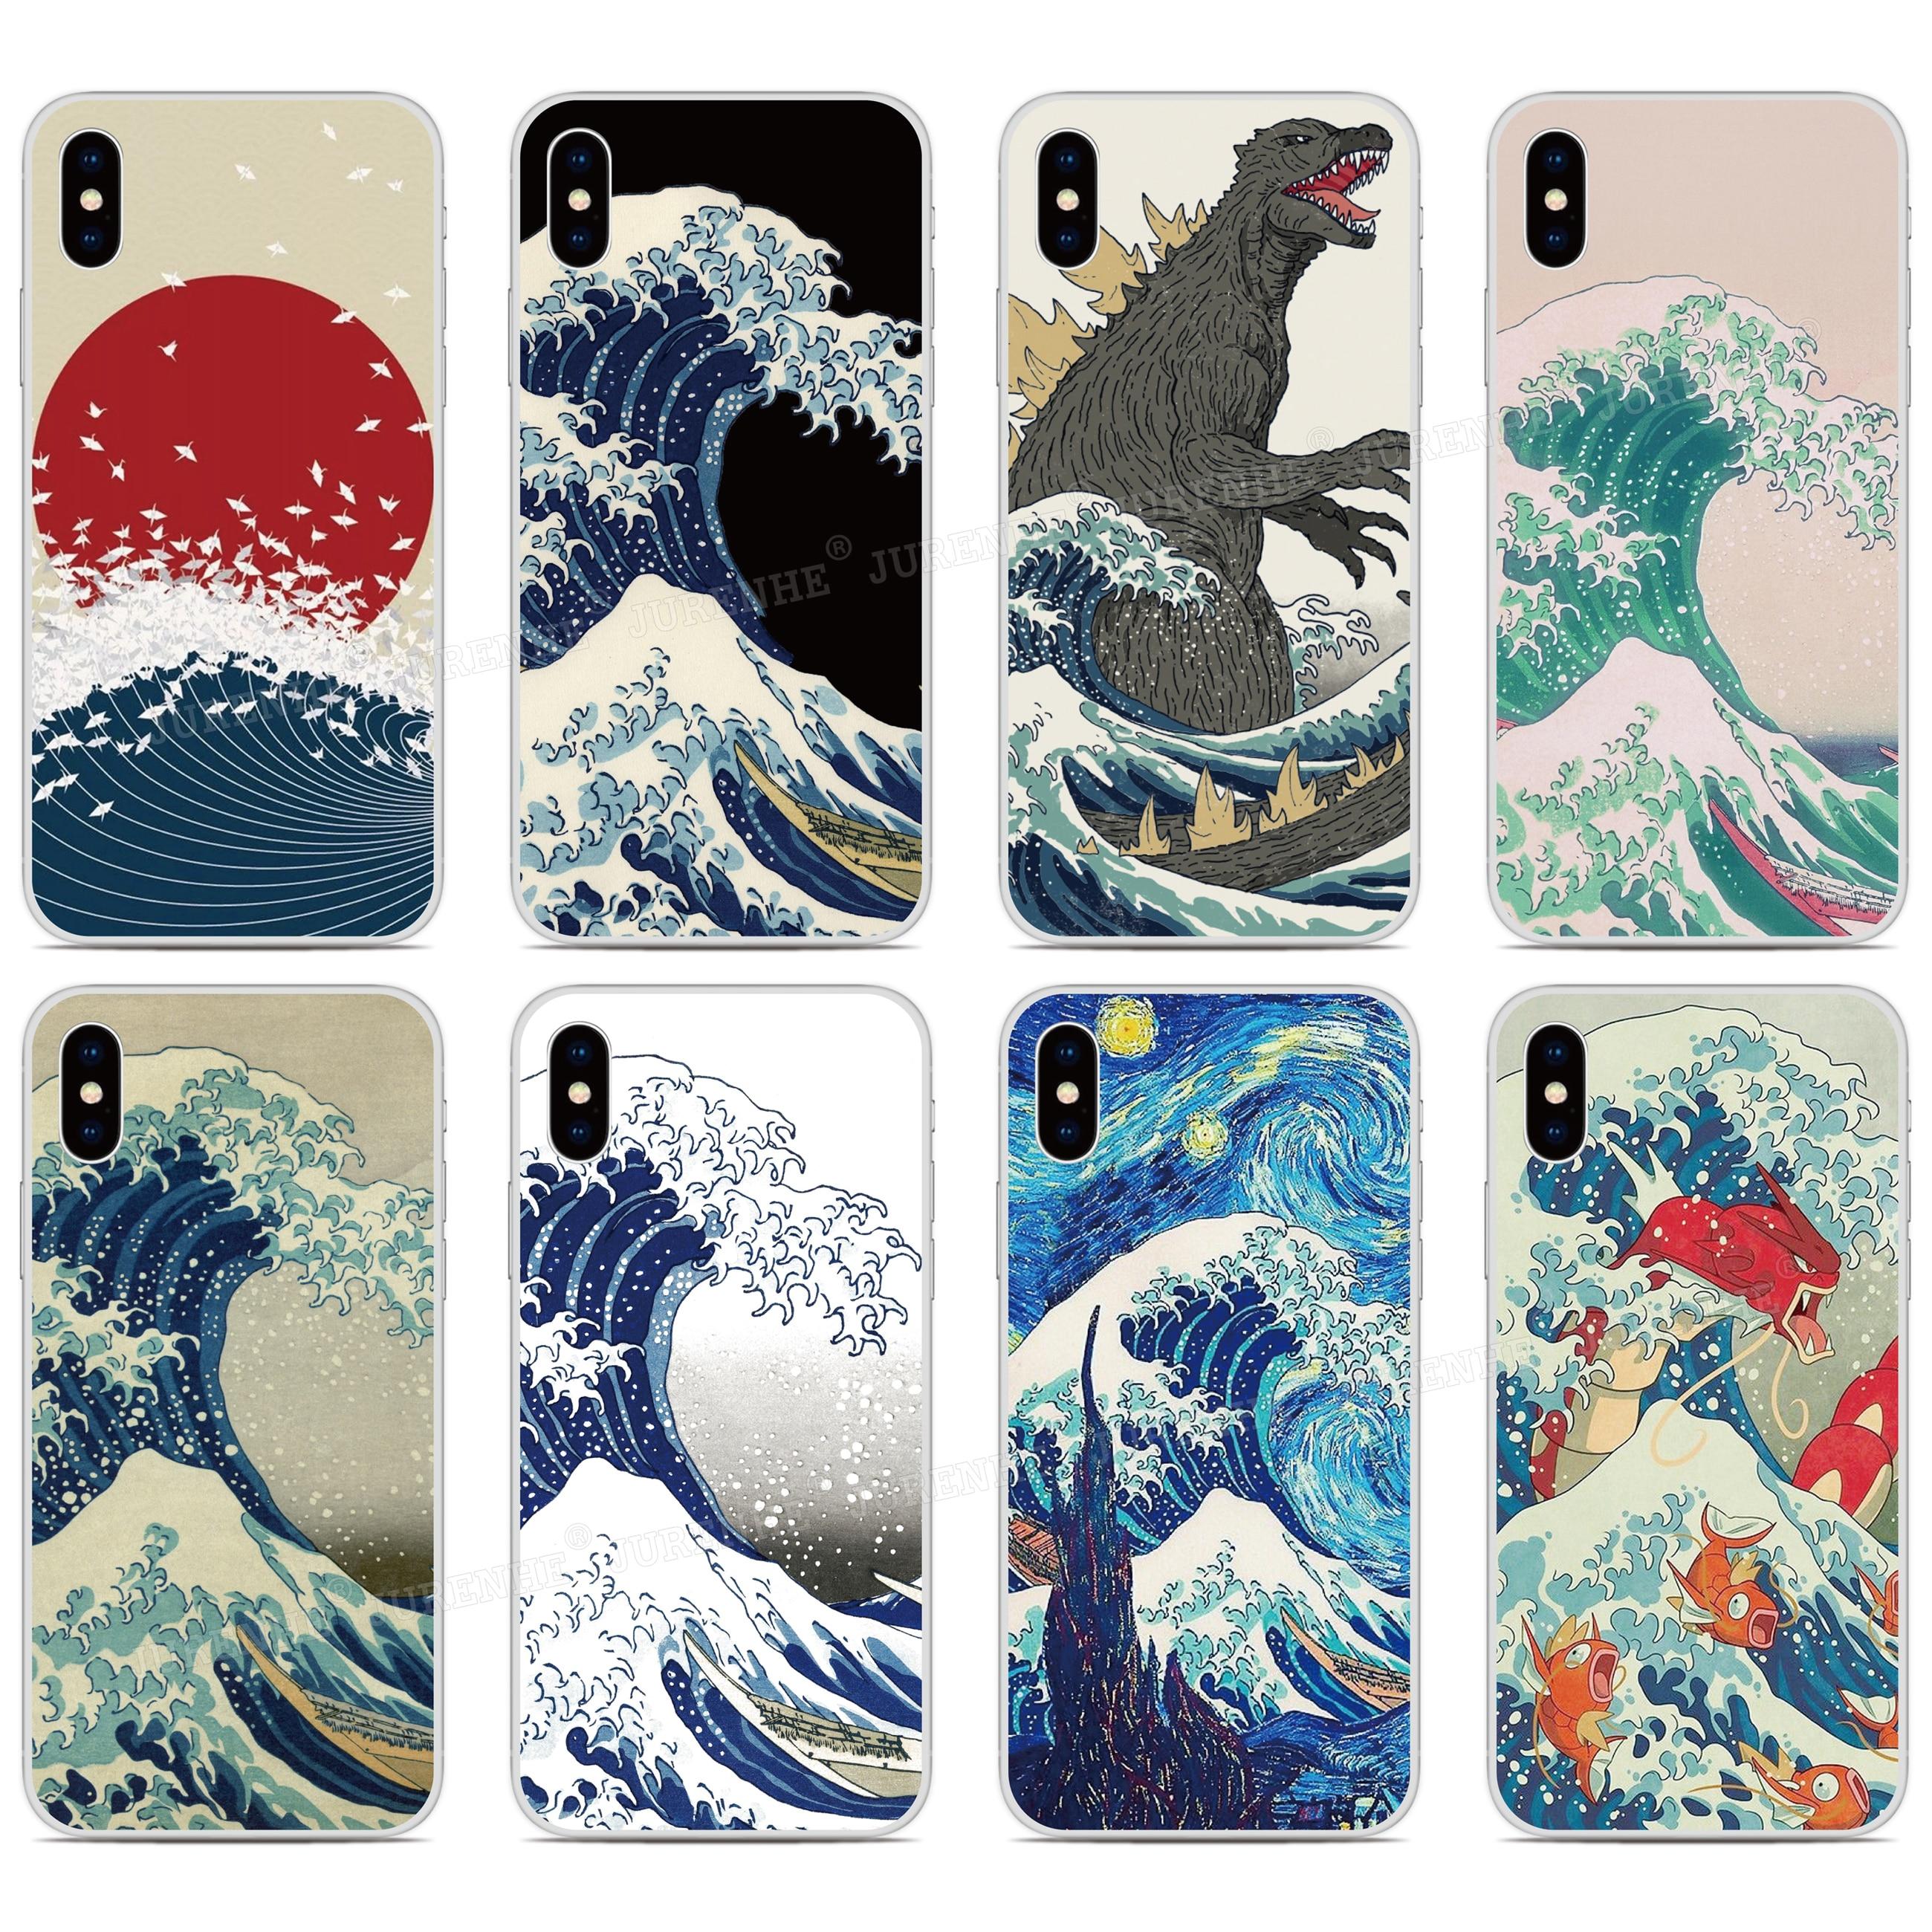 Wave off Kanagawa Bumper Phone Case For BlackBerry-Priv KEYone KEY 2 Motion Passport Q30 Z10 Z30 Q10 DTEK50 DTEK60 DTEK70 Cover(China)